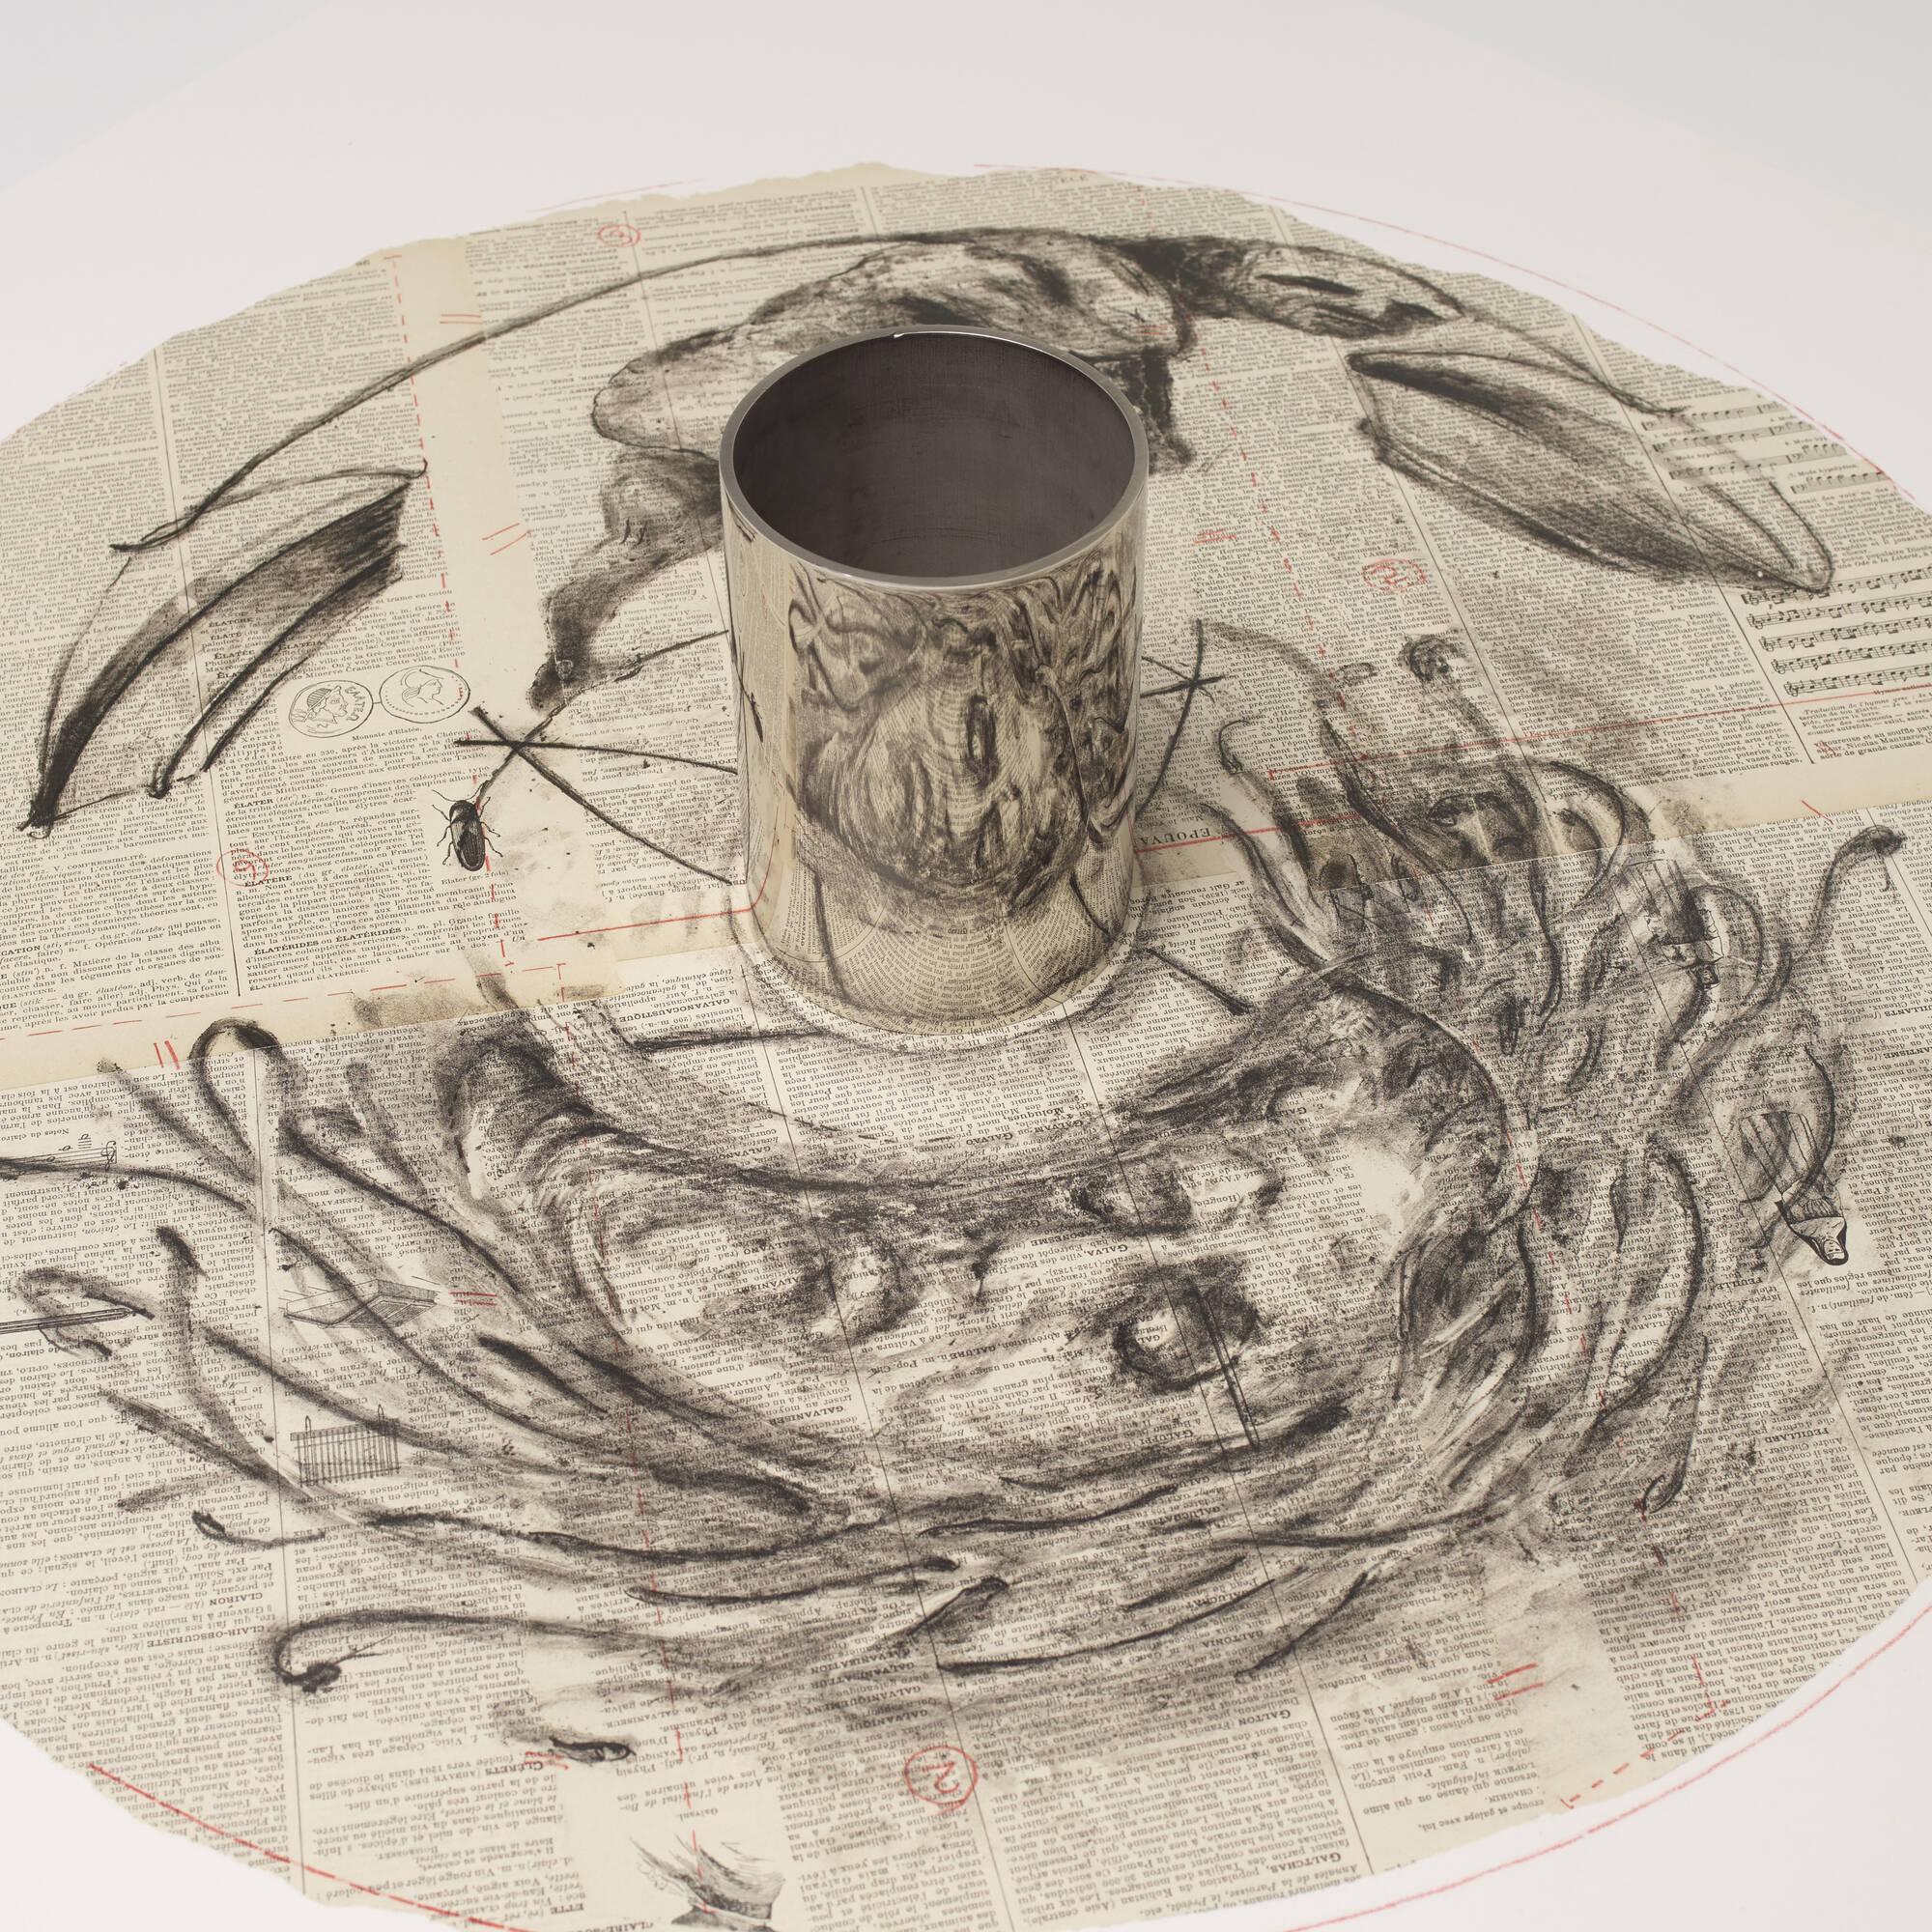 208: William Kentridge / Medusa (2 of 3)